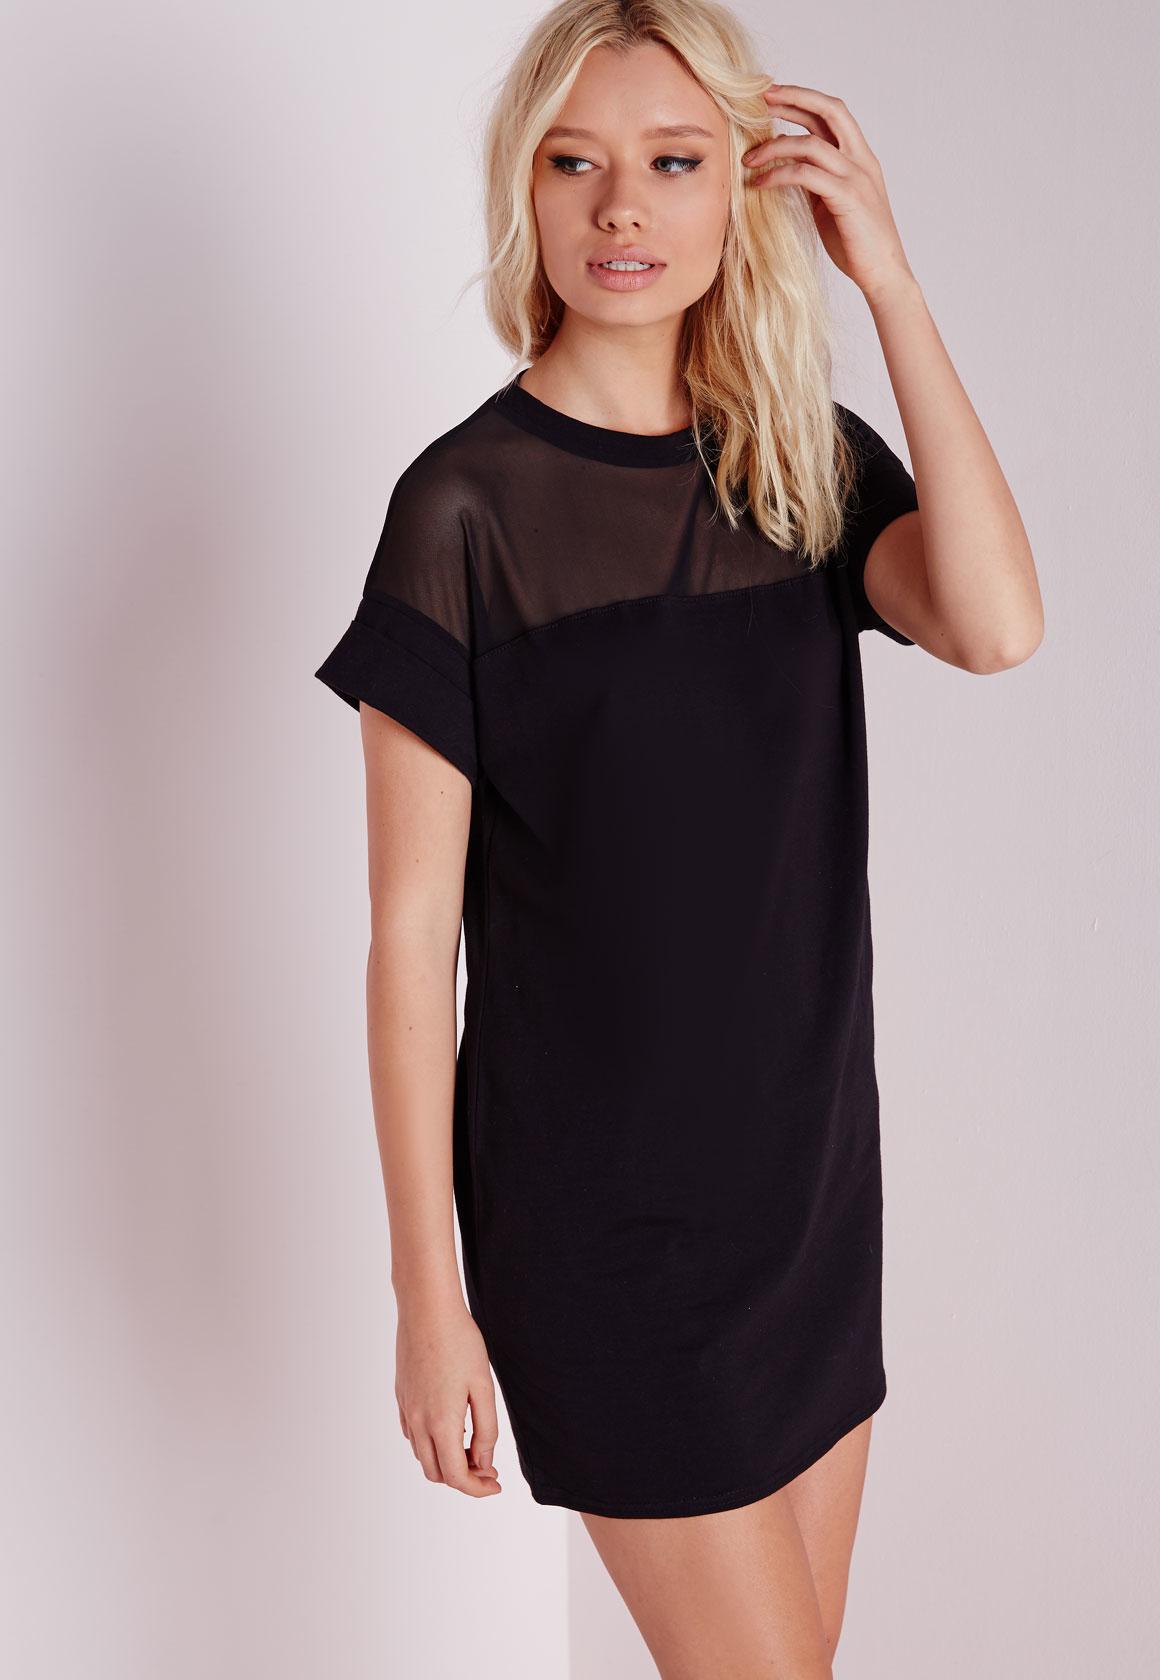 b8714e8472d Missguided Mesh Panel T-shirt Dress Black in Black - Lyst